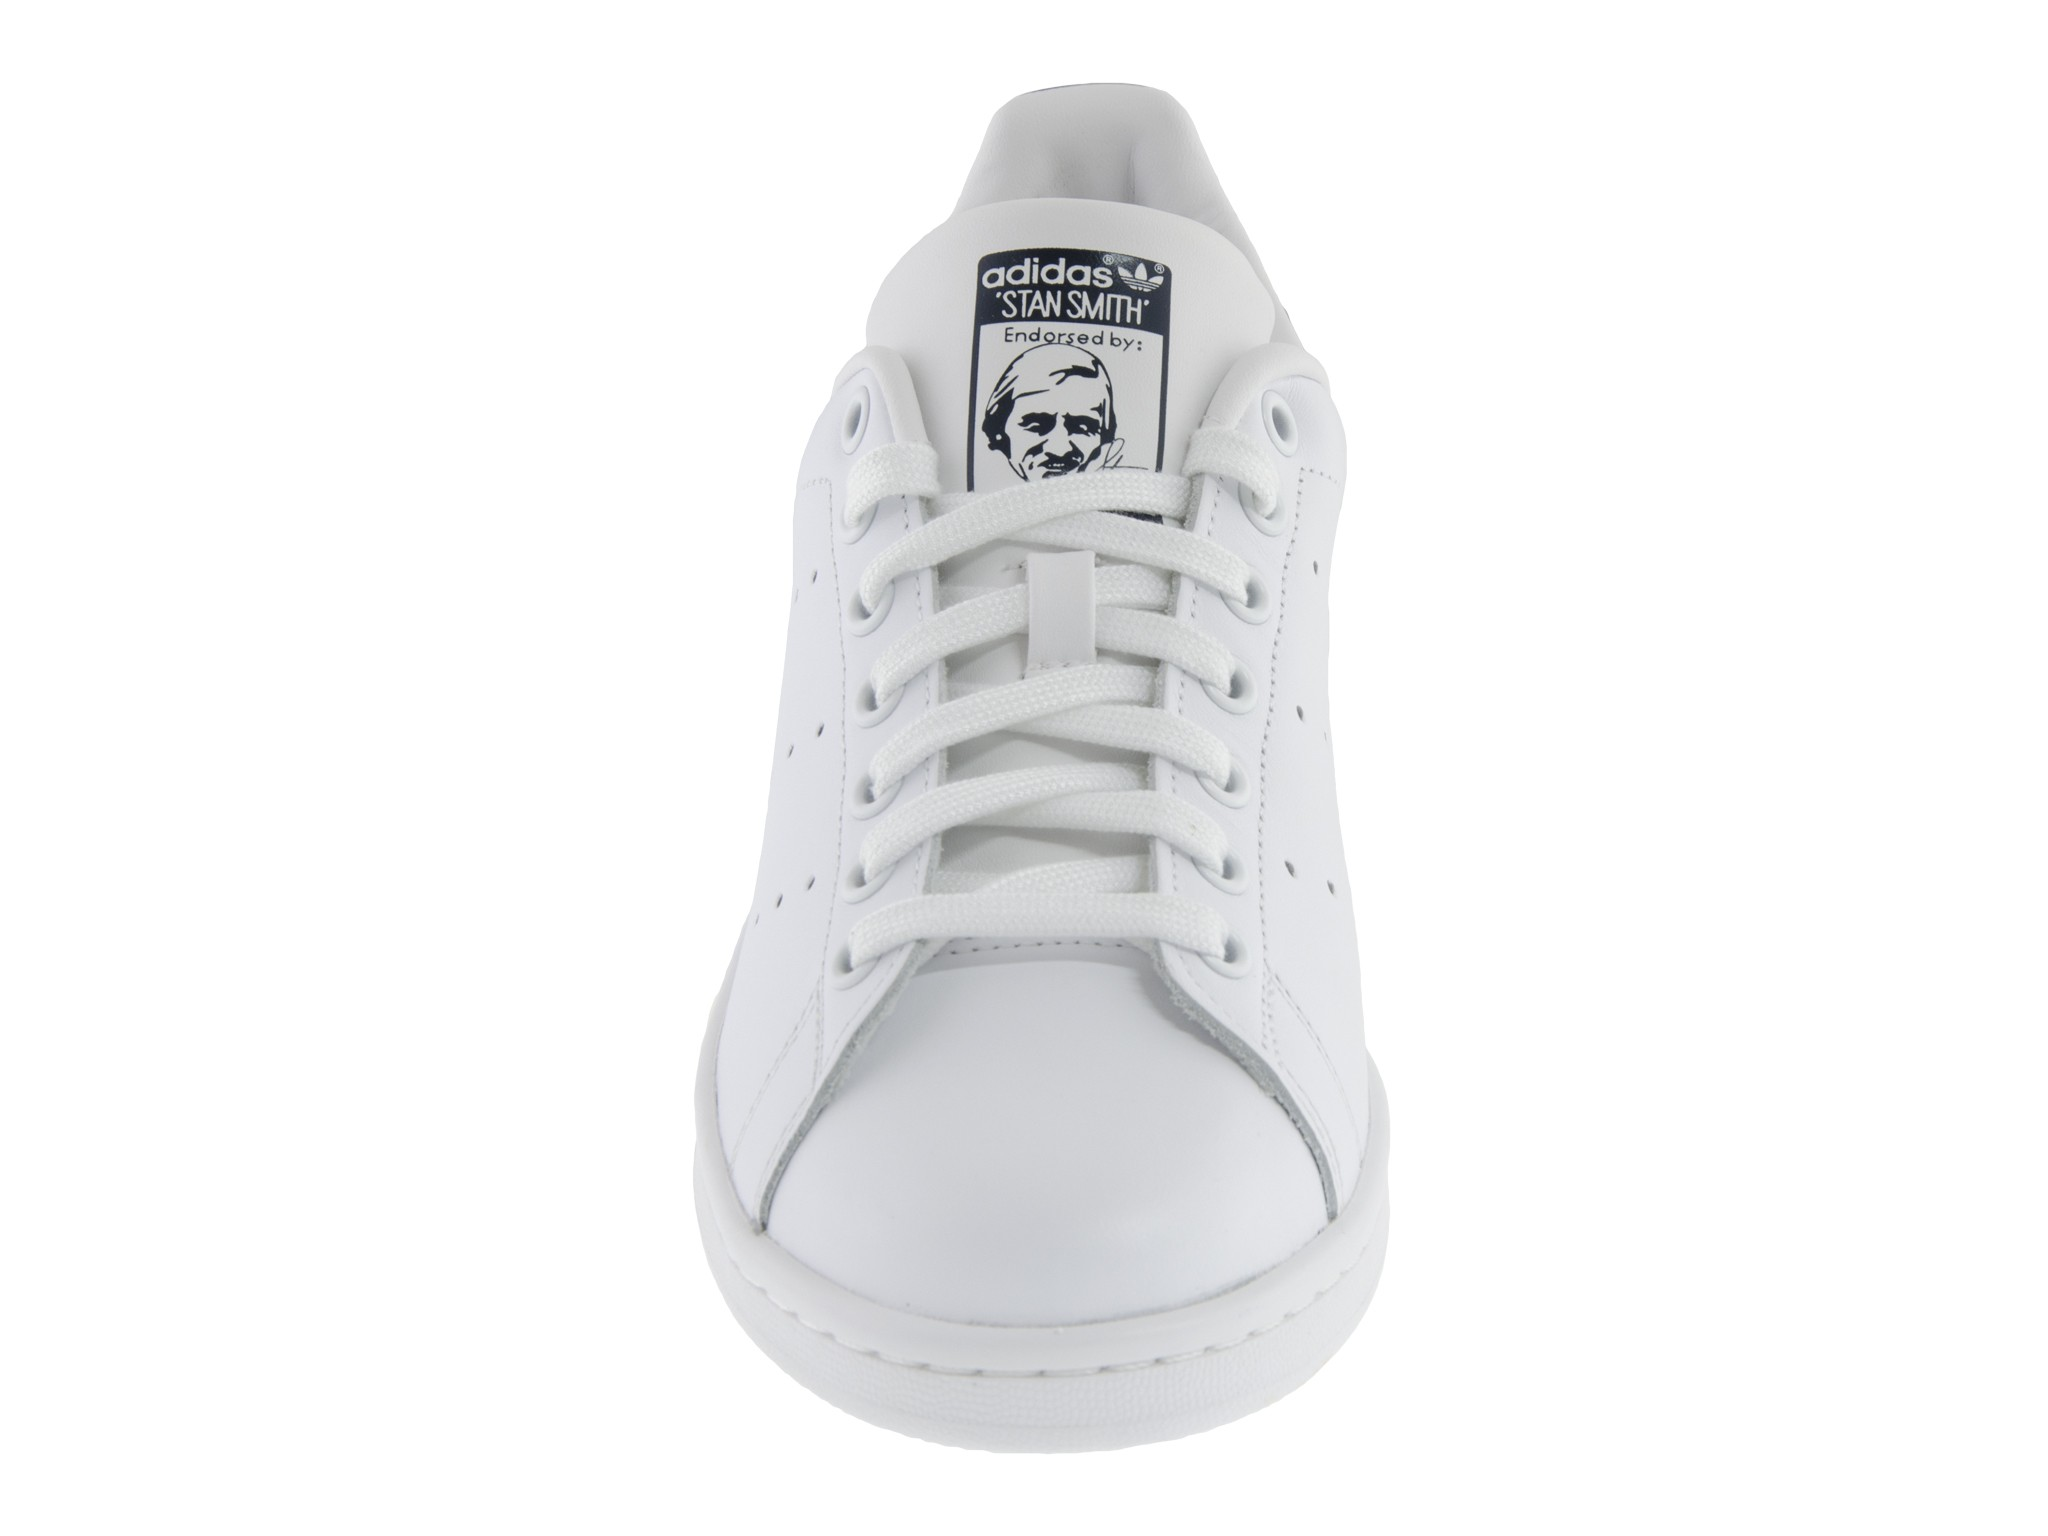 scarpe-adidas-stan-smith-uomo-bianco-e-blu.jpg 2b2629e1fec